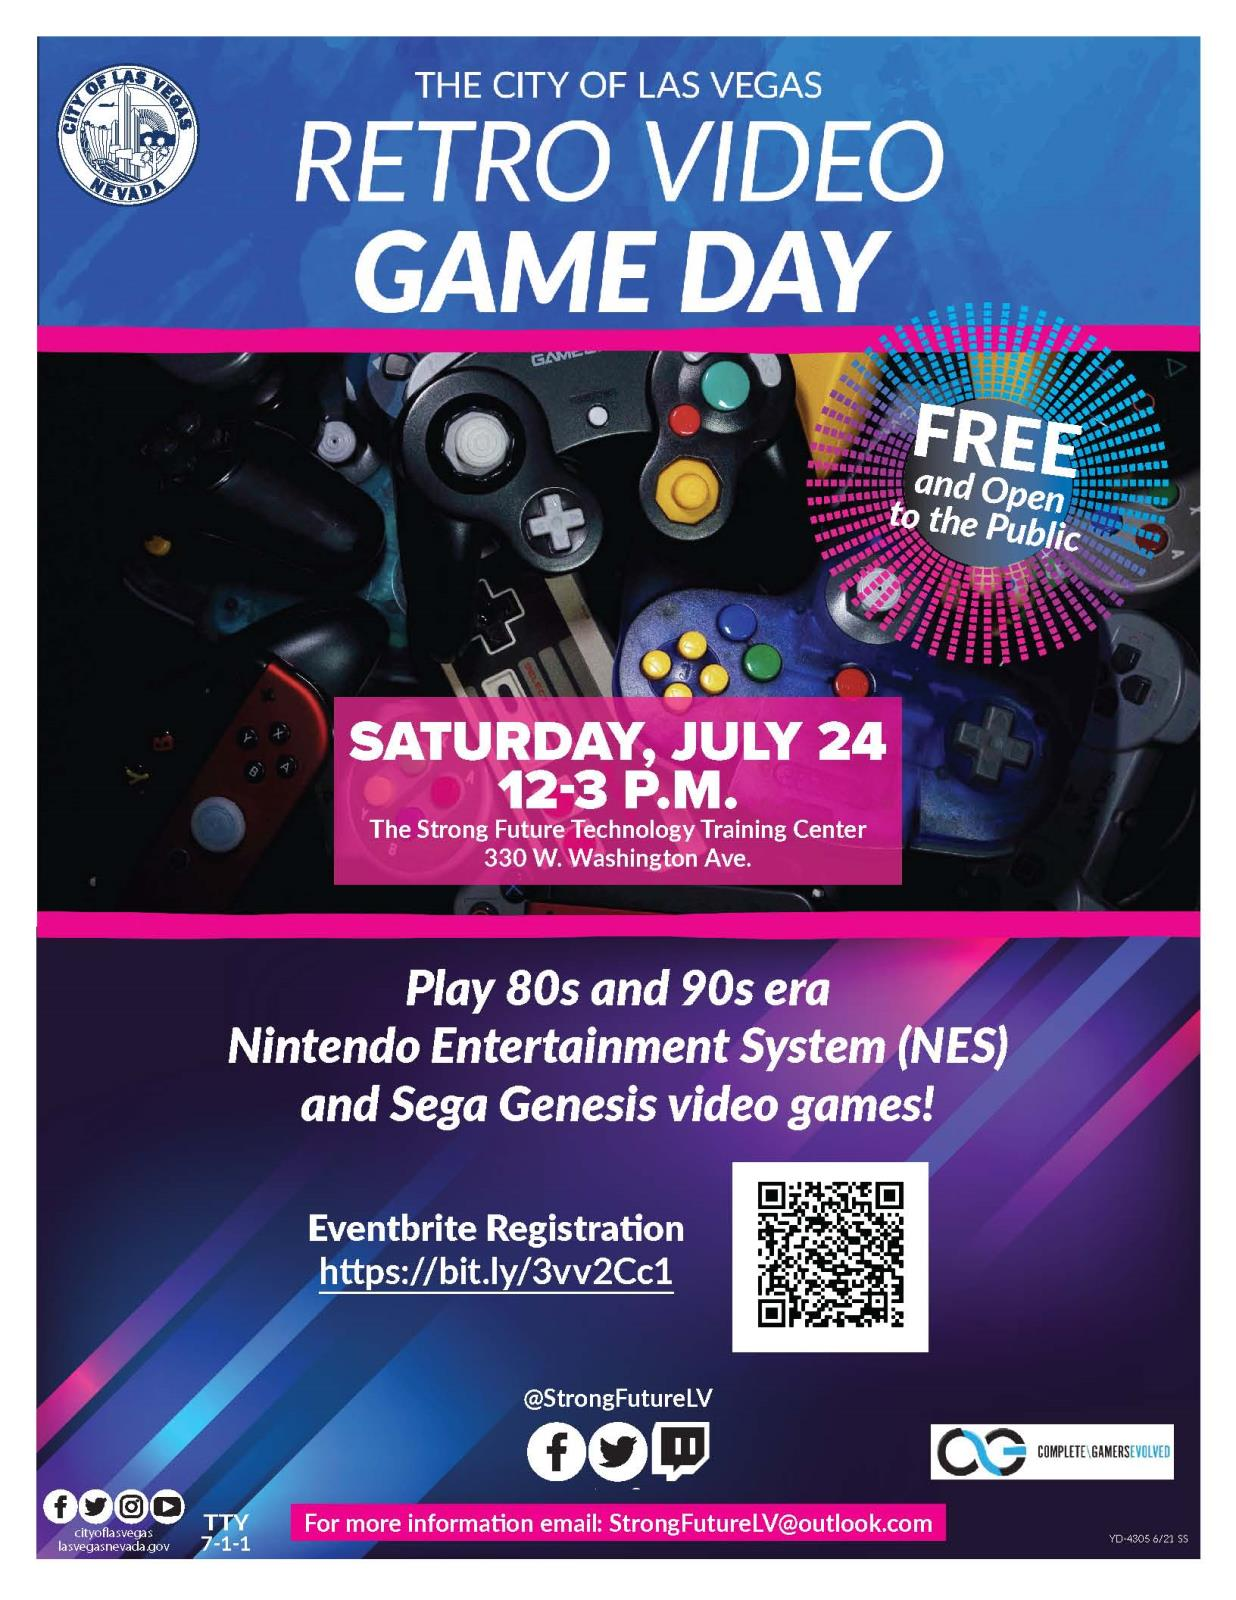 YDSI Retro Video Game Day flyer-7-24-21.jpg